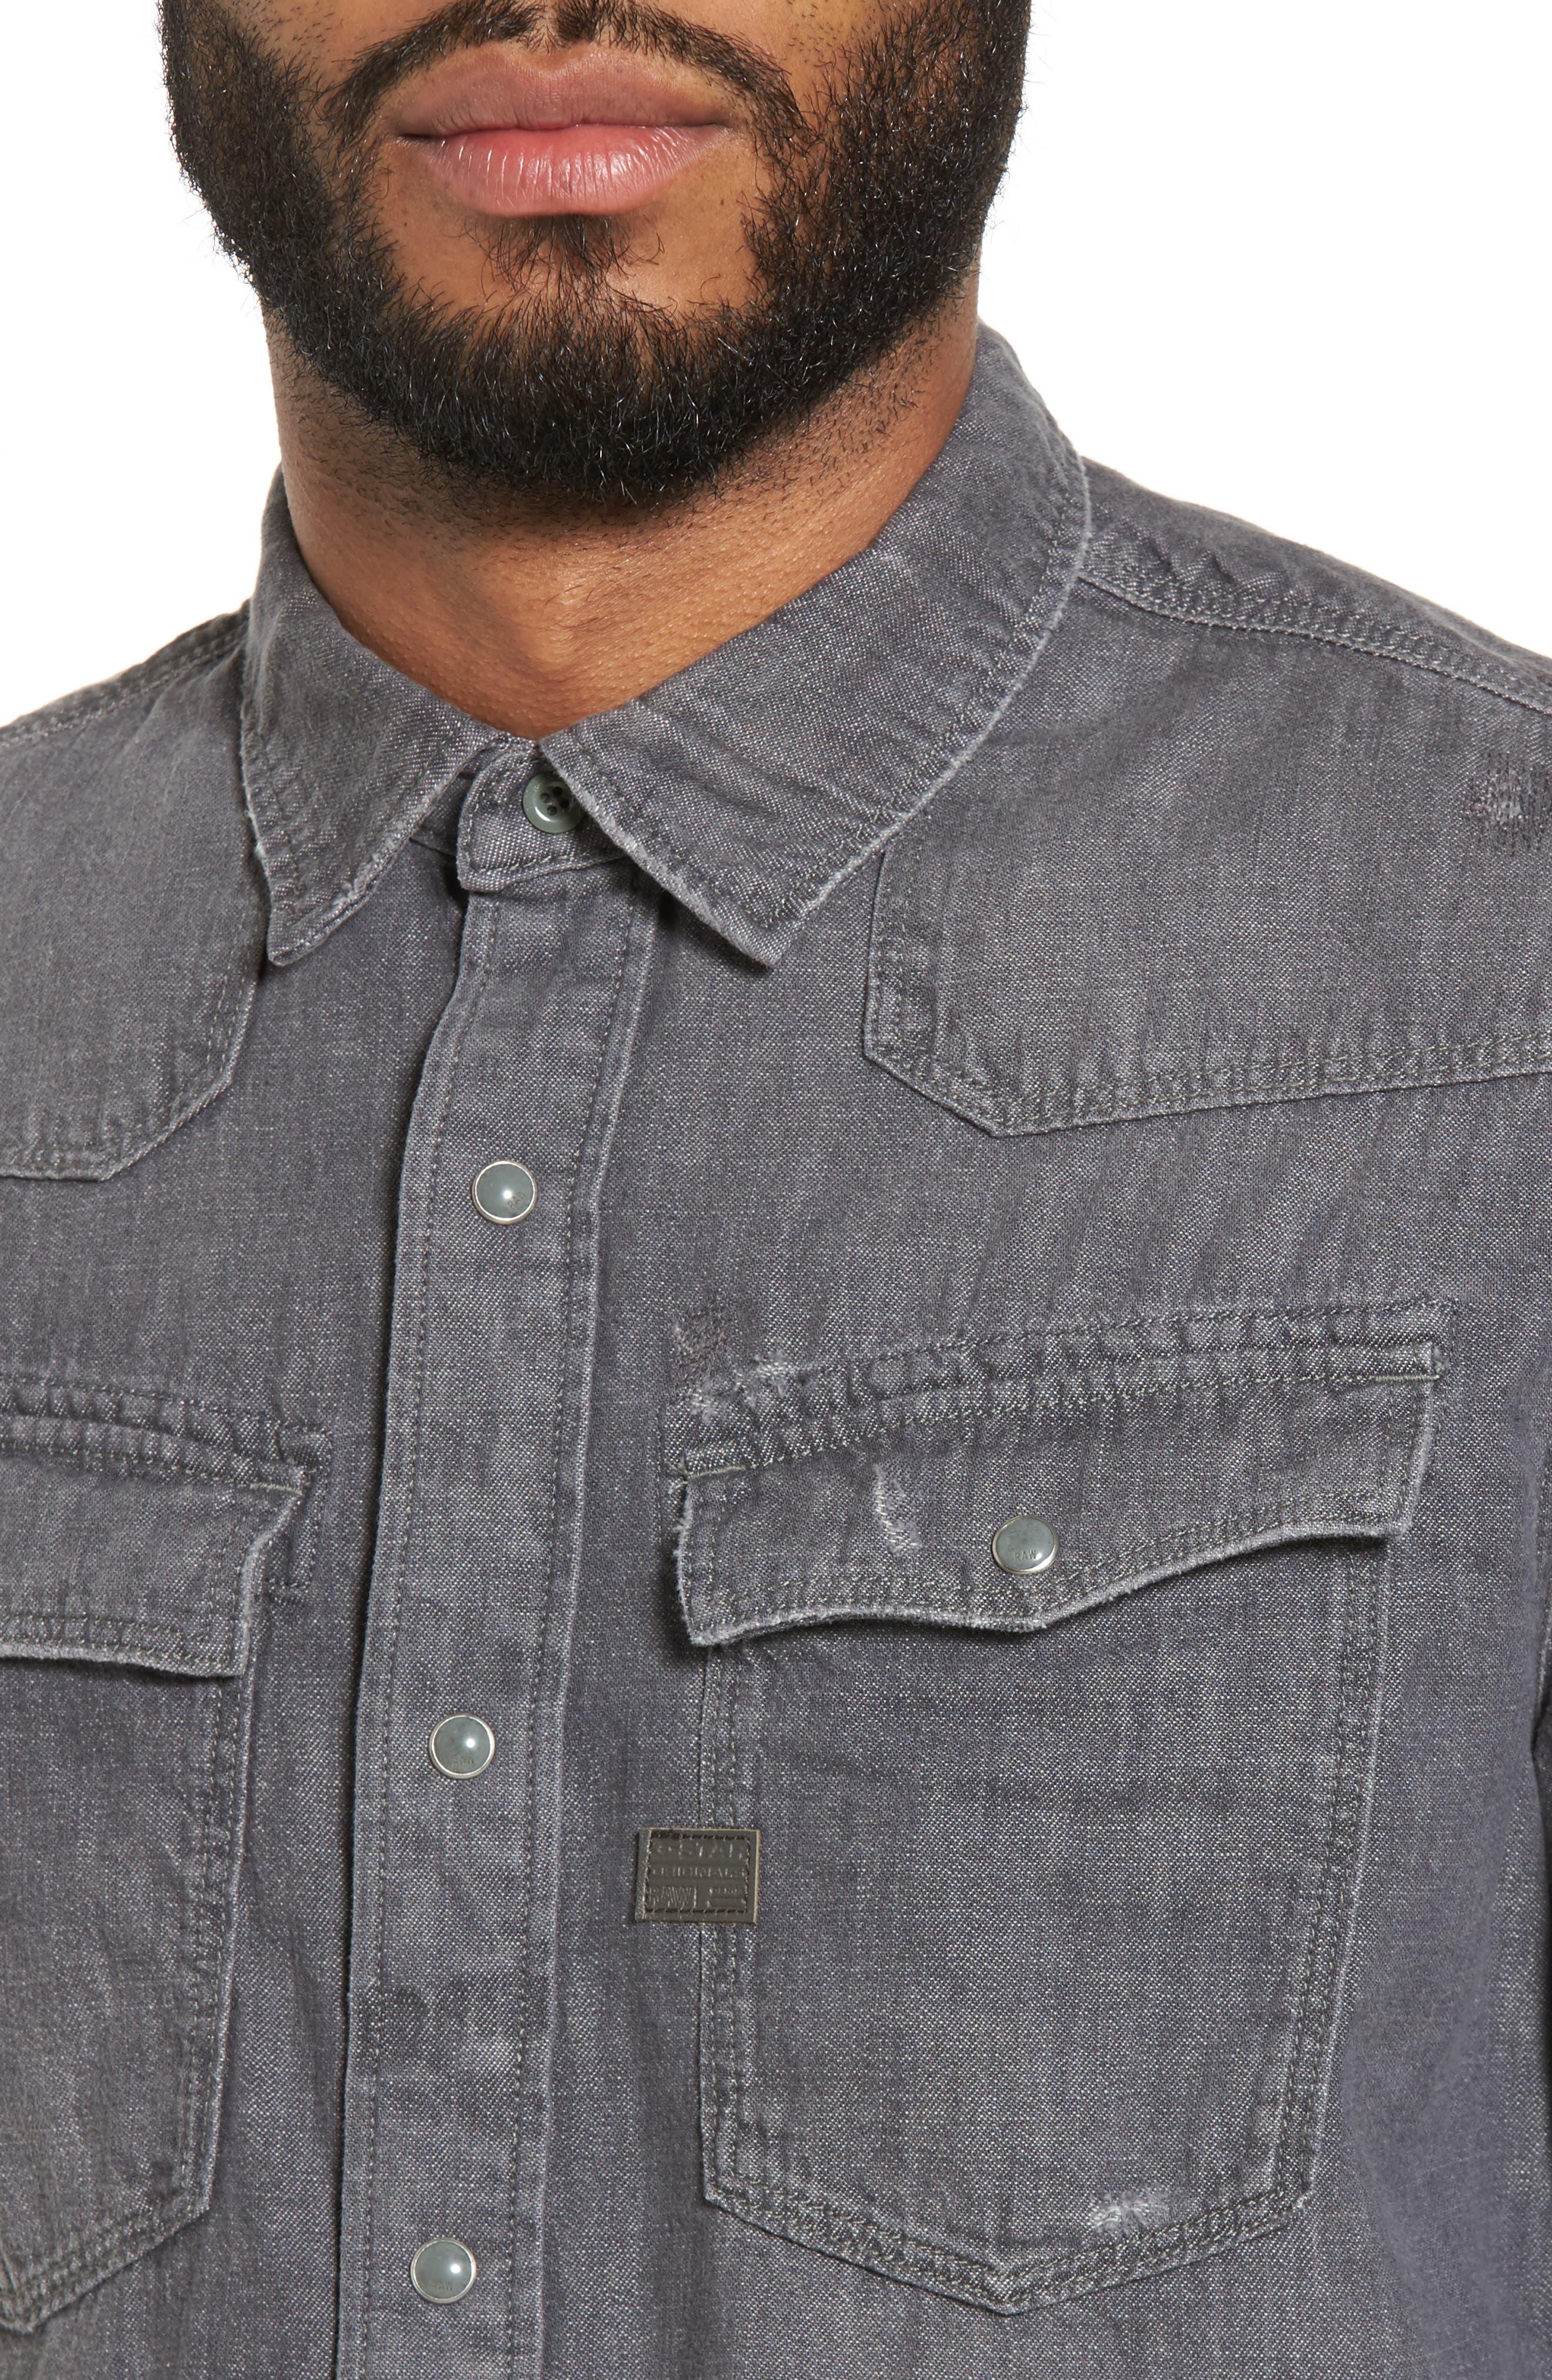 3301 Craser Denim Shirt,                             Alternate thumbnail 4, color,                             Medium Aged Restored